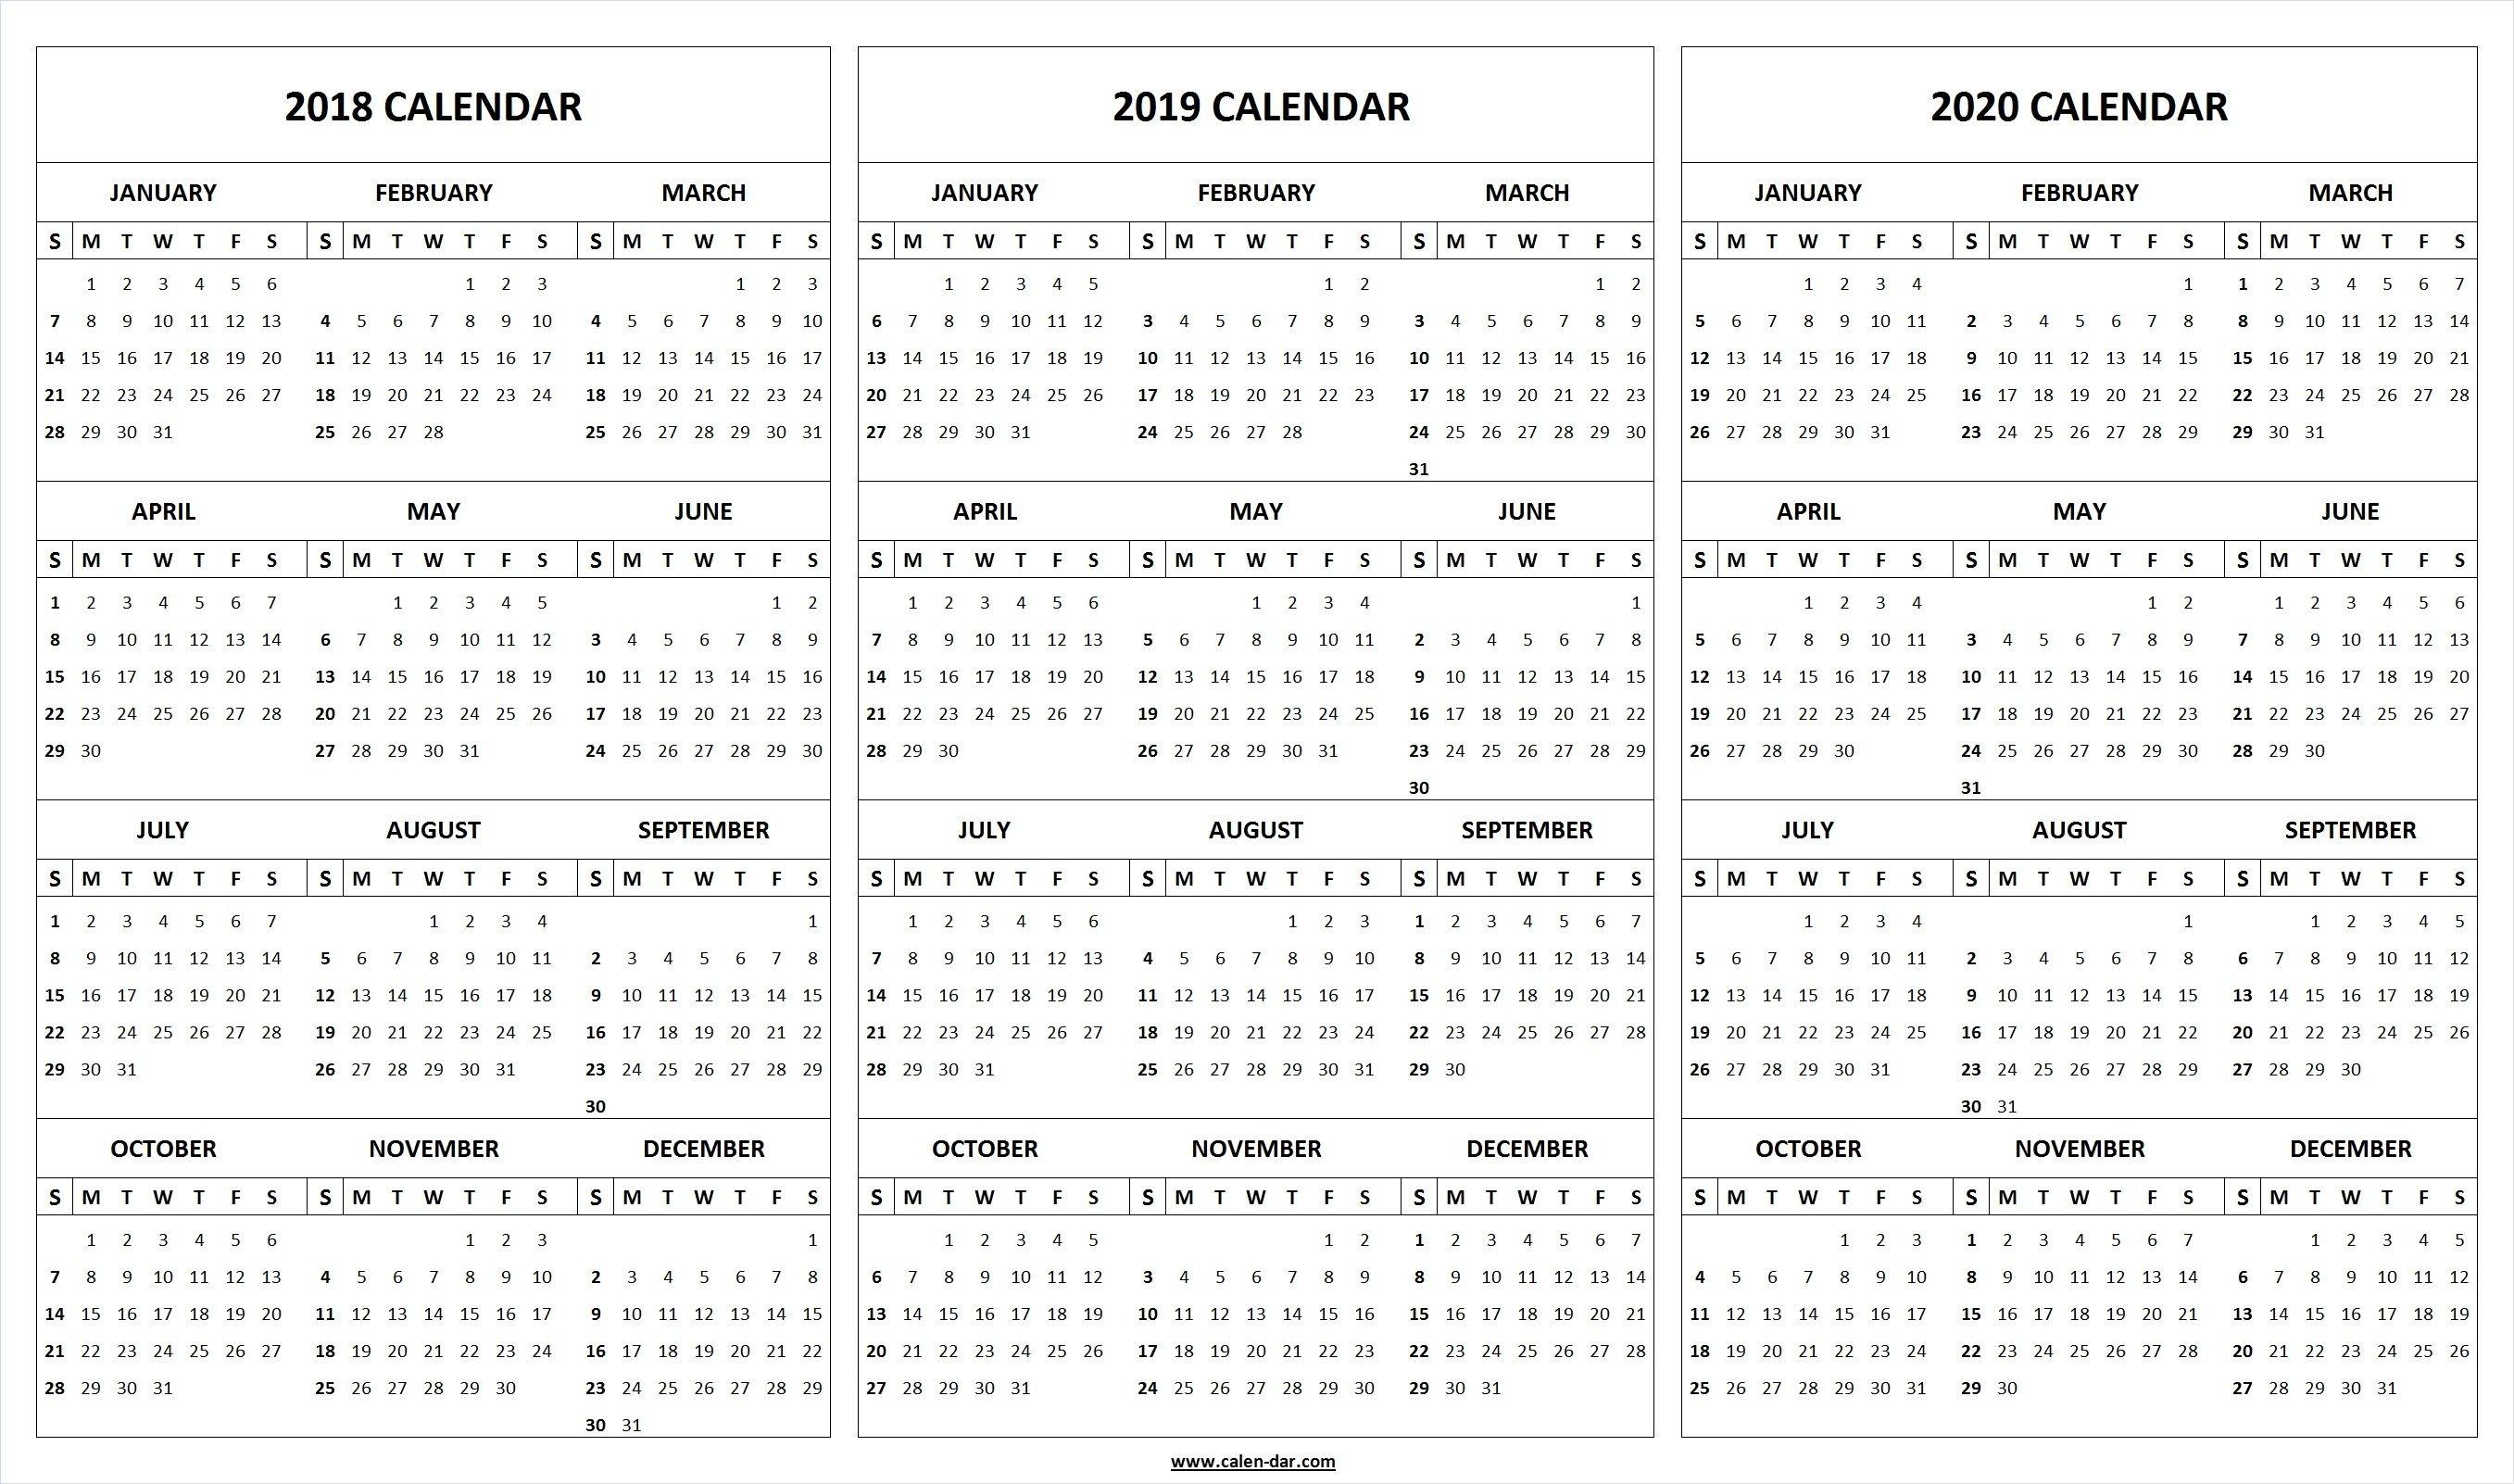 Print Blank 2018 2019 2020 Calendar Template | Organize! | Printable with Blank Calendar Pages 2019-2020